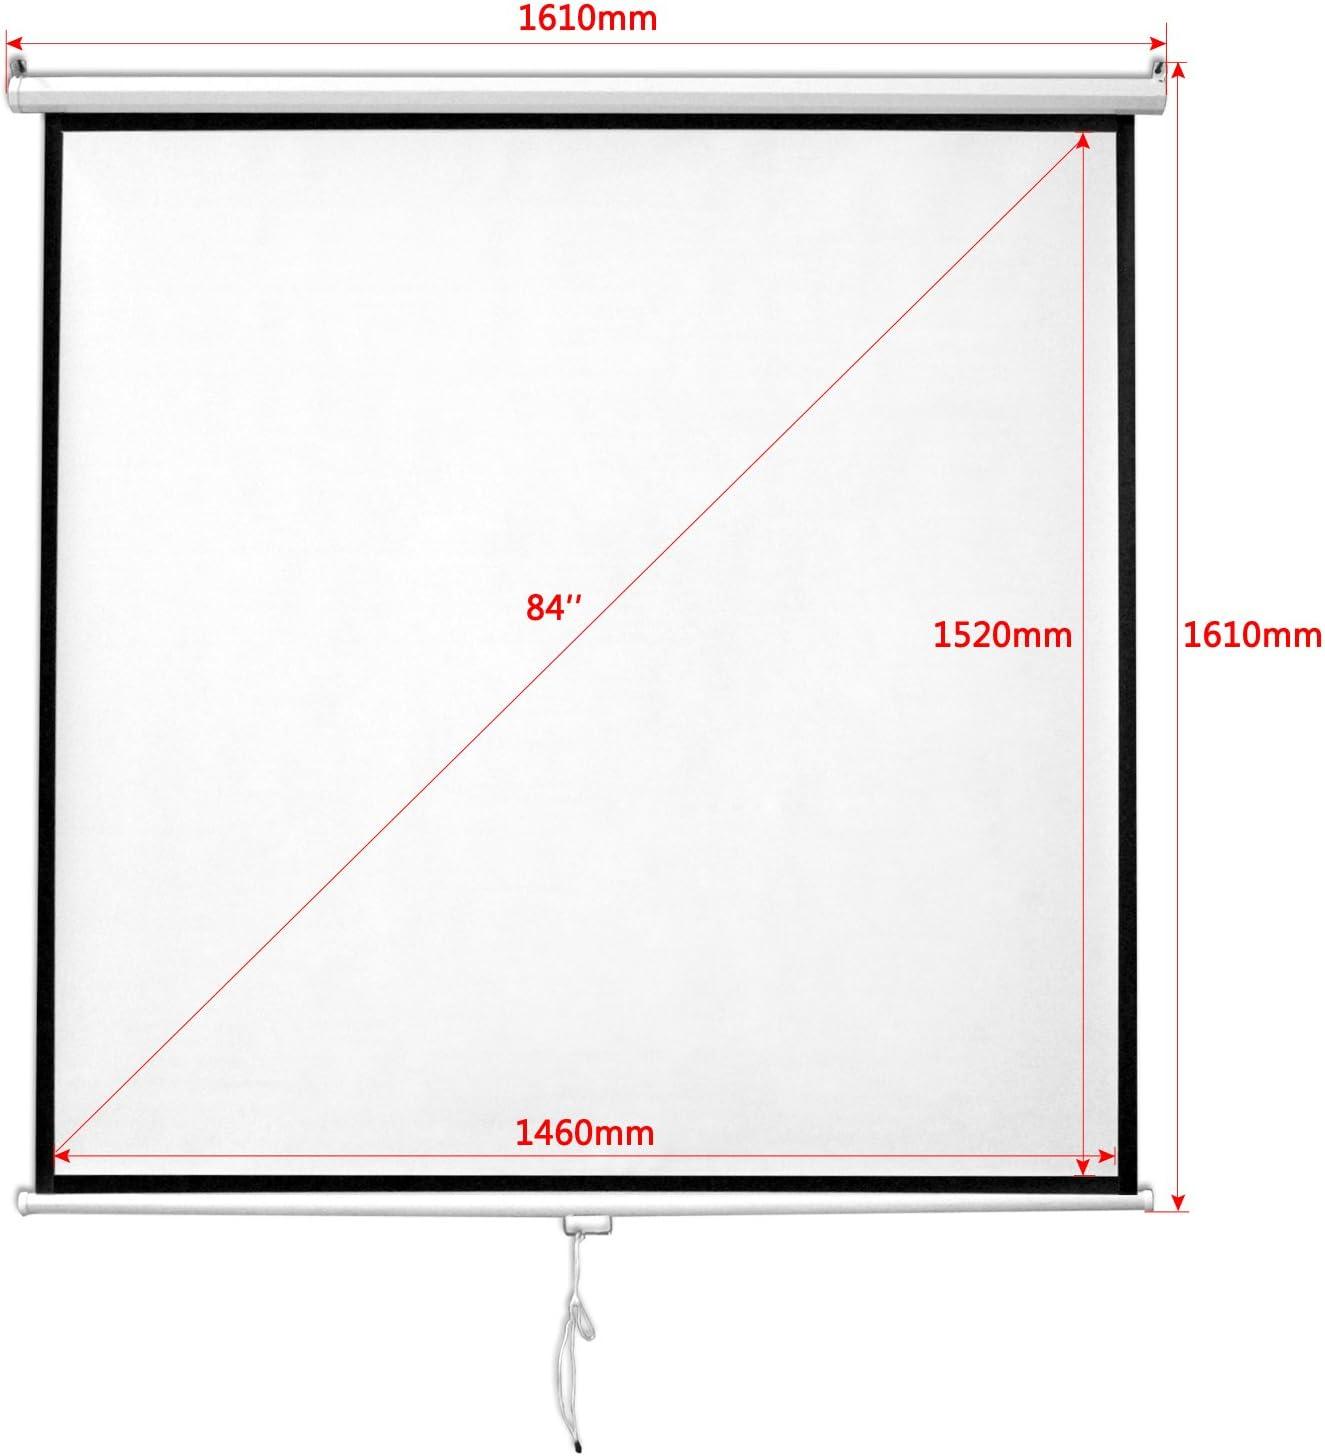 16:9 HENGMEI Beamer Leinwand Rolloleinwand projektionsleinwand 84//99 Zoll Nutzfl/äche- Format 1:1 84 Zoll 4:3 Heimkino Business Leinwand wandmontage und deckenmontage